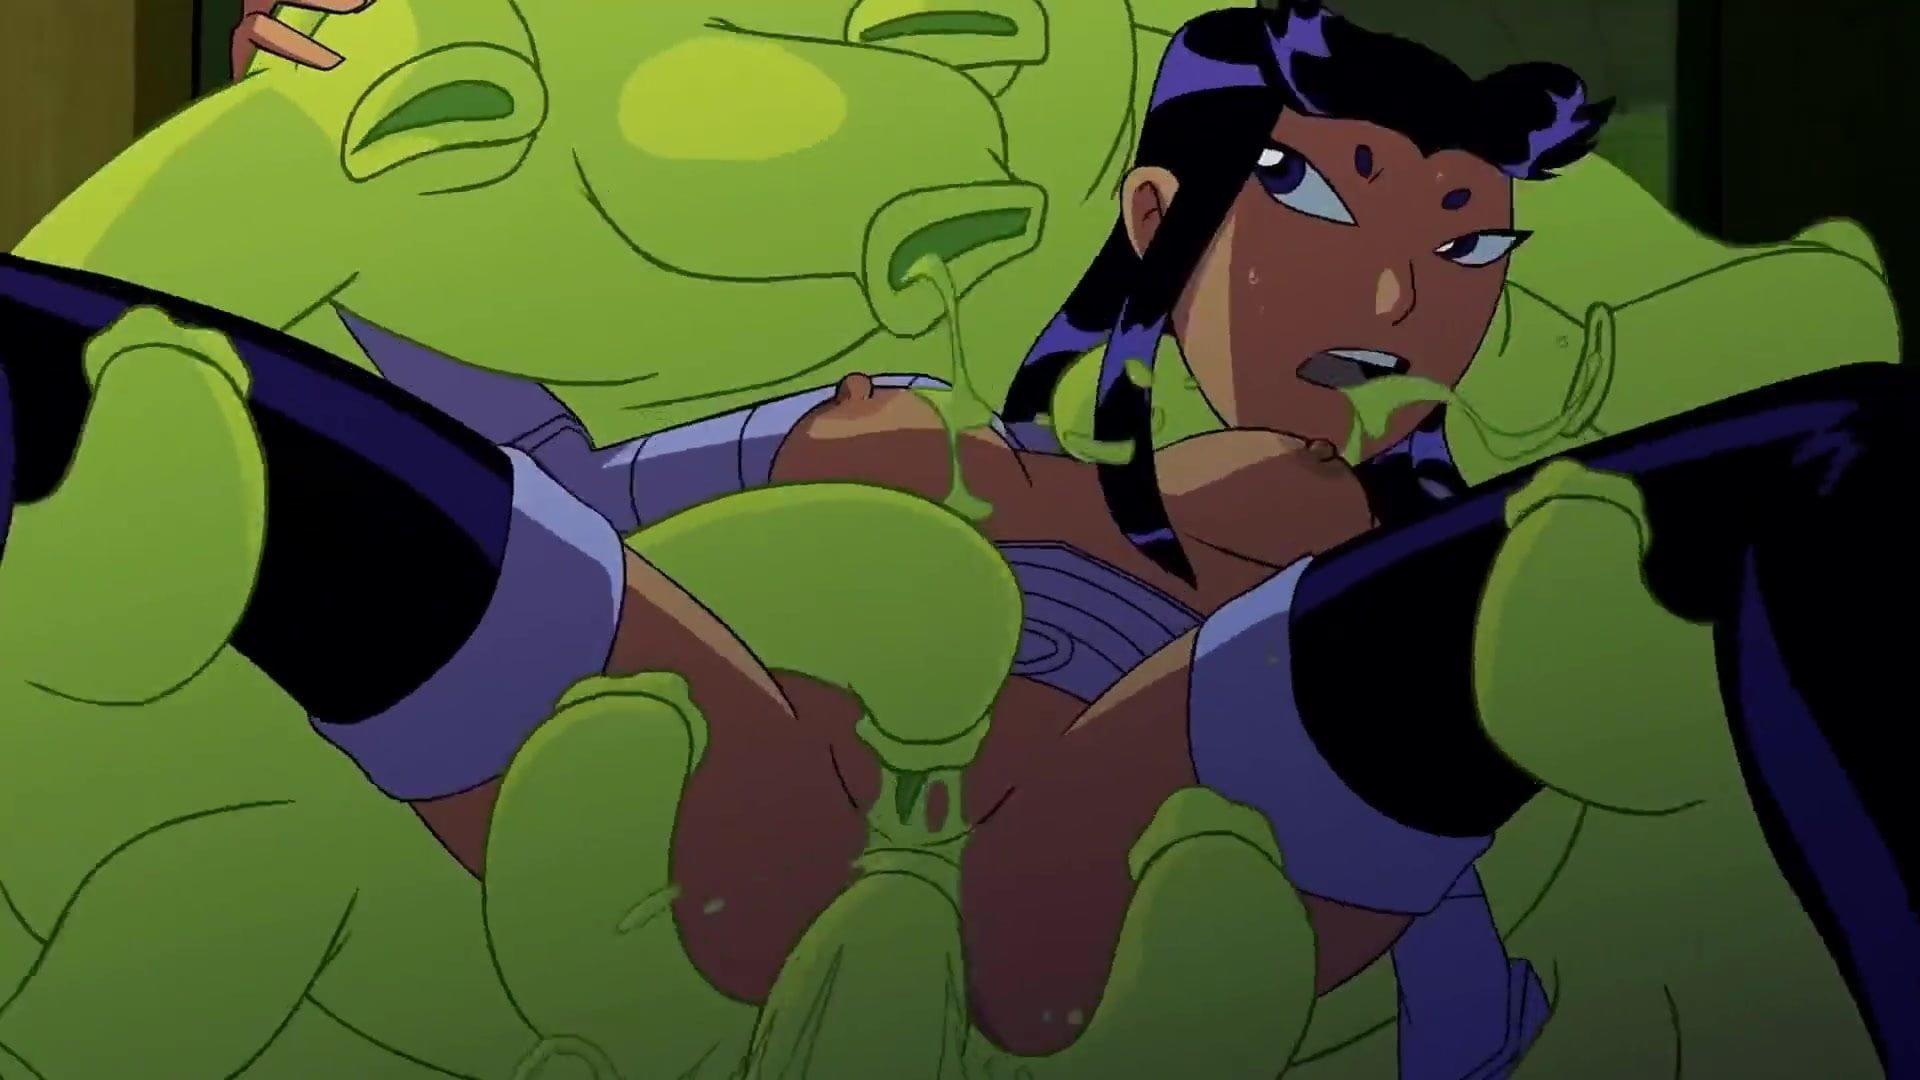 Teen Titans Blackfire Sex Scene, Free Hd Porn Eb Xhamster-2496